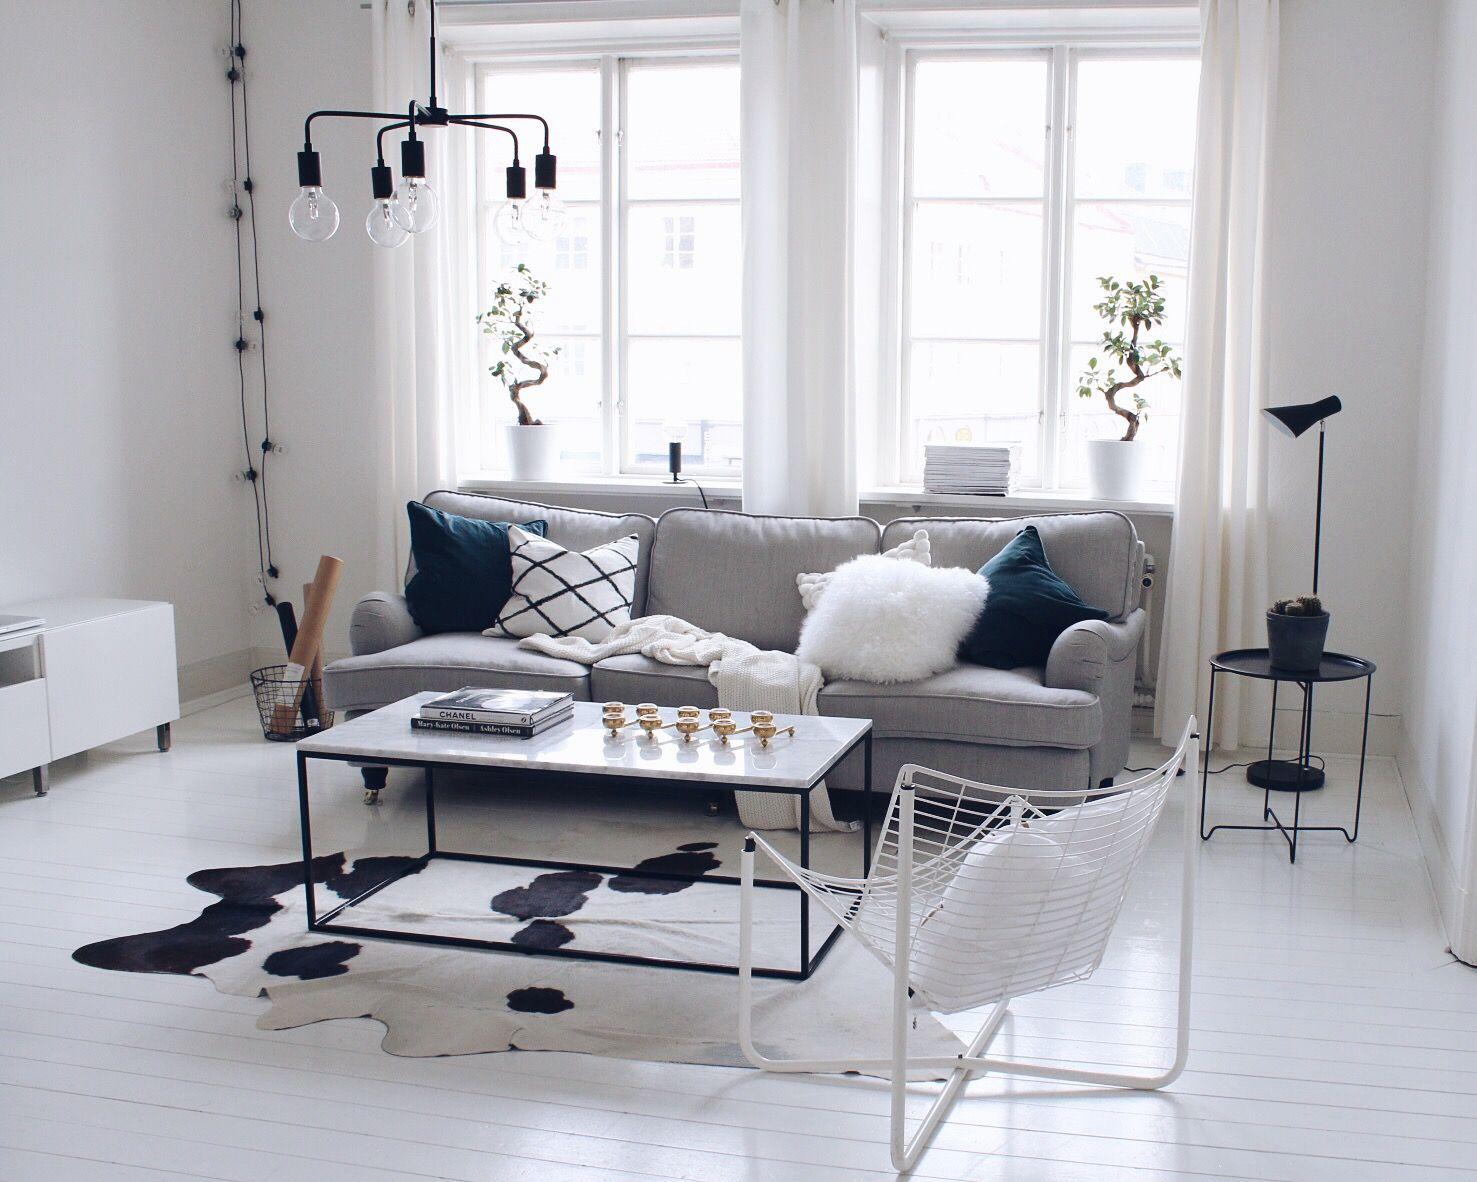 Joanna frank interior design 10 shocking facts about for 10 interesting facts about interior design